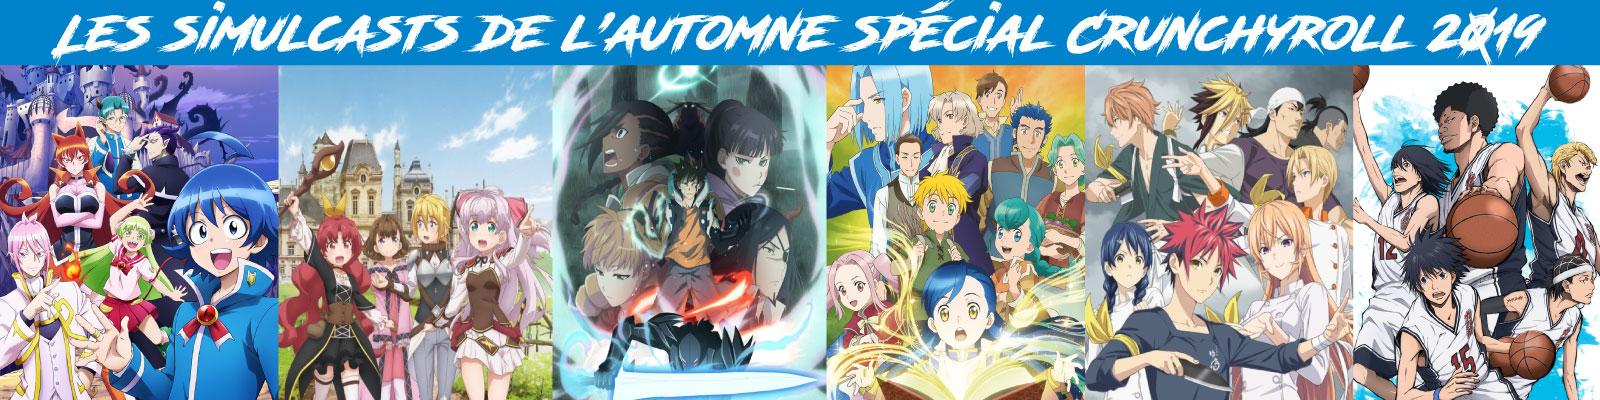 Les-simulcasts-automne-crunchyroll-2019